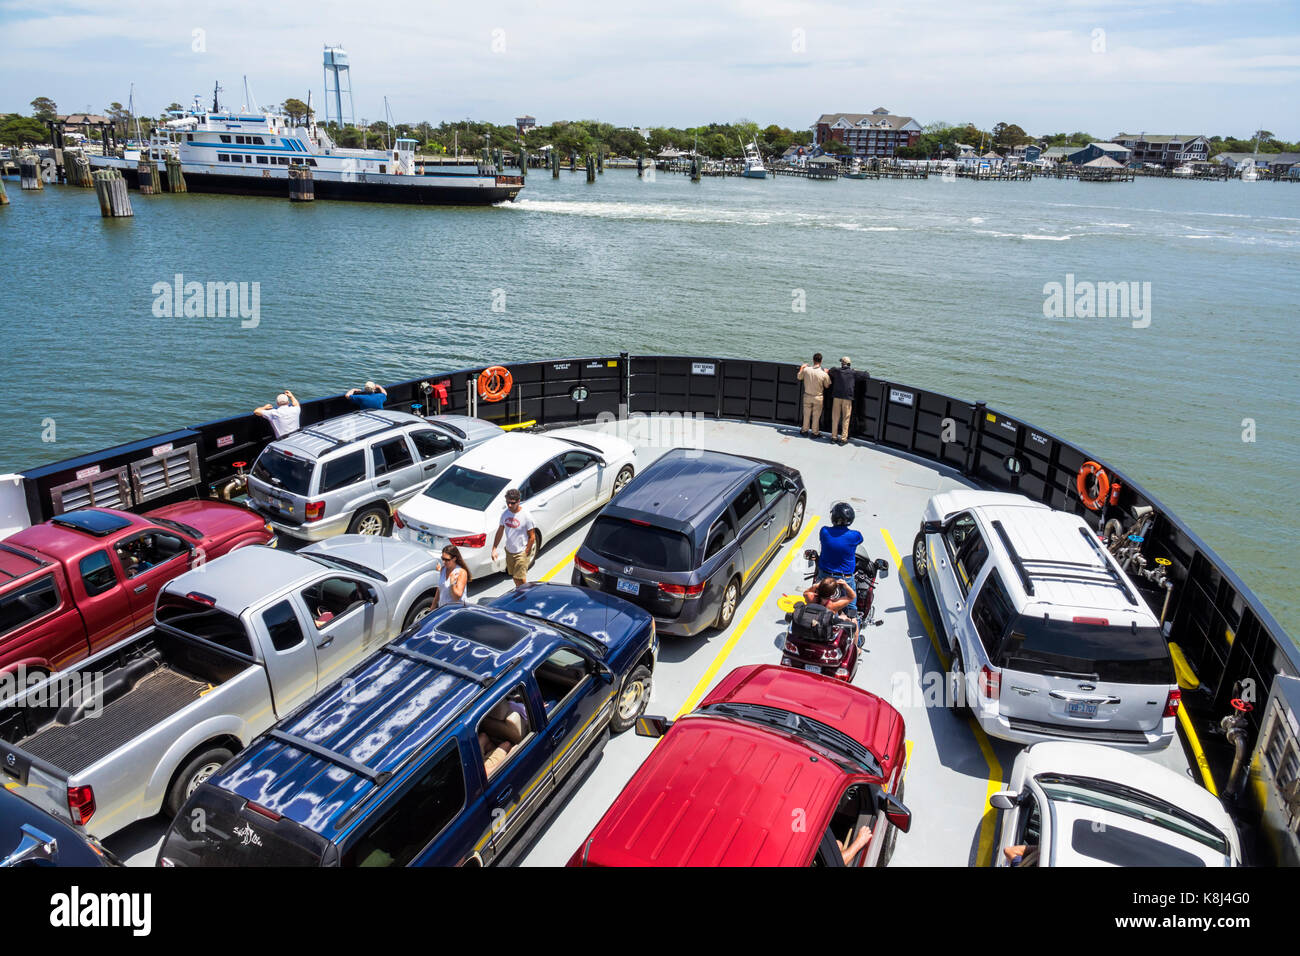 Outer Banks North Carolina NC Ocracoke Island ferry boat harbor arriving cars vehicles - Stock Image